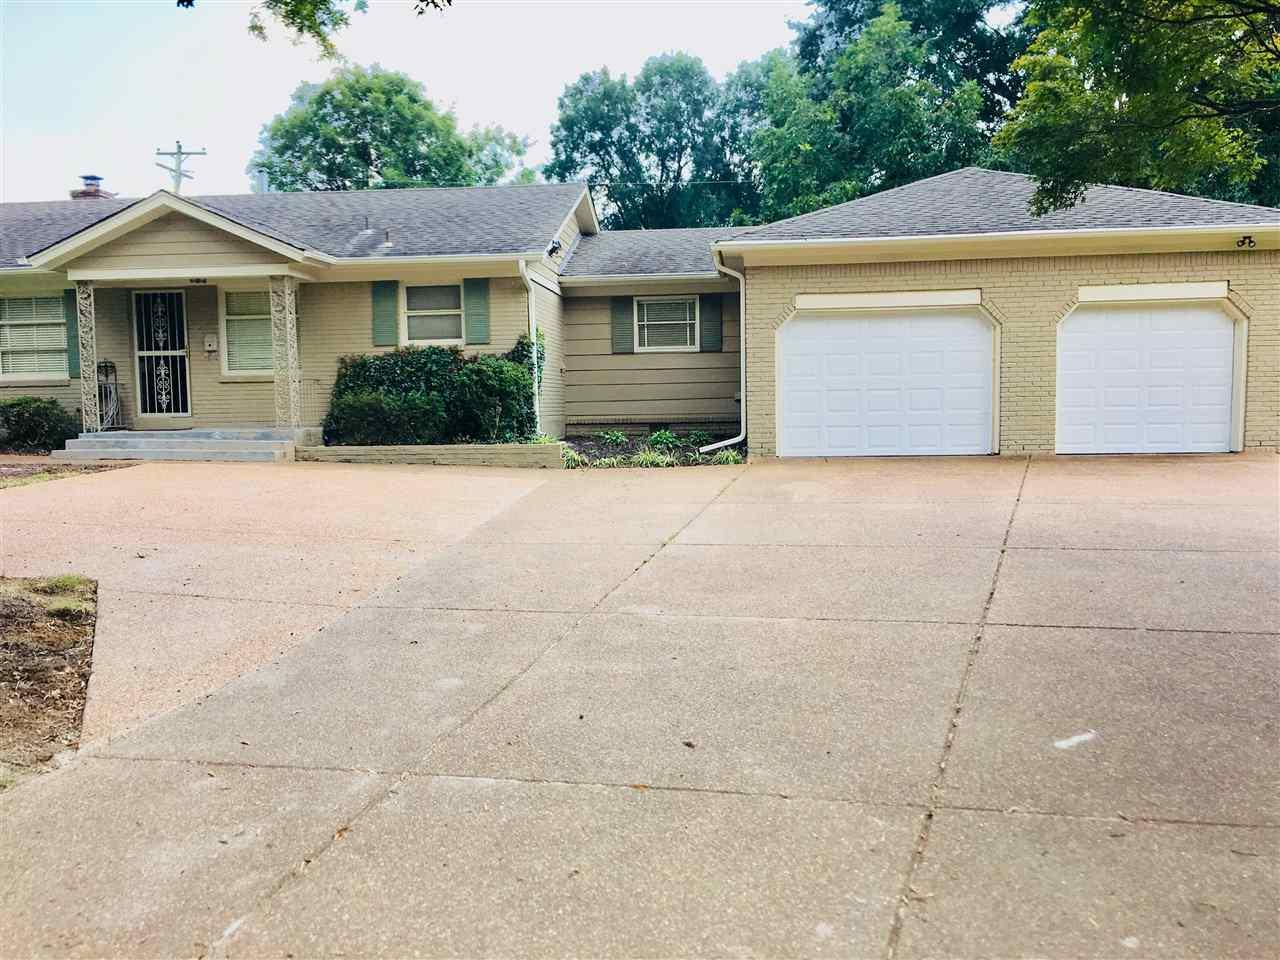 4989 Devonshire Memphis, TN 38117 - MLS #: 10011572